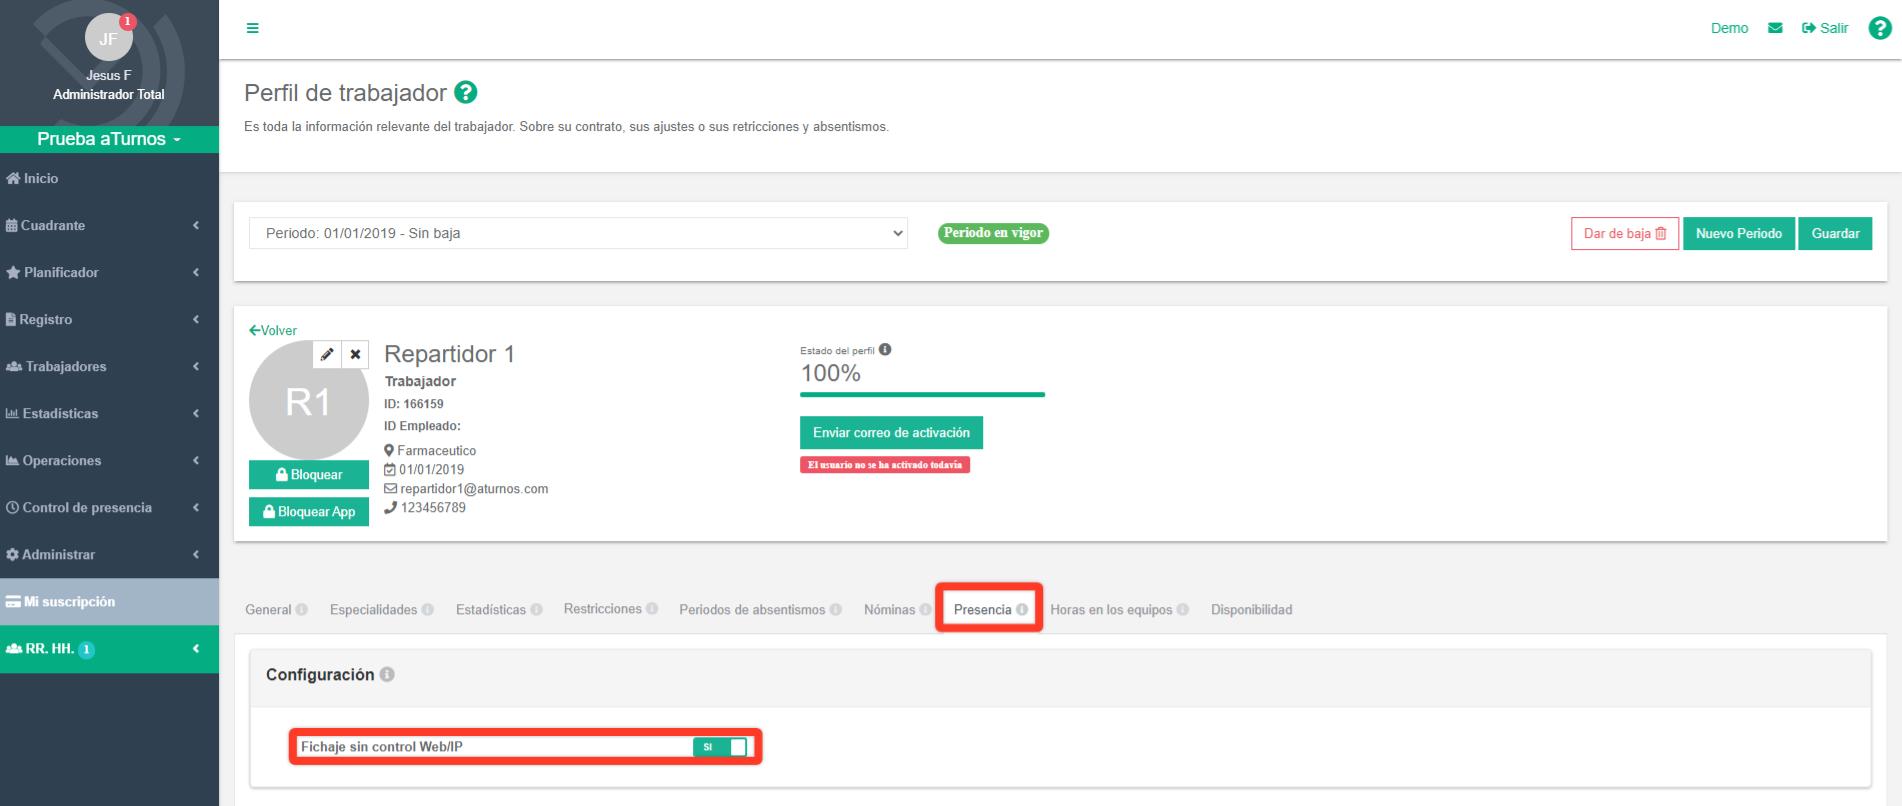 aTurnos - Google Chrome 2021-01-14 at 12.19.16 PM.png